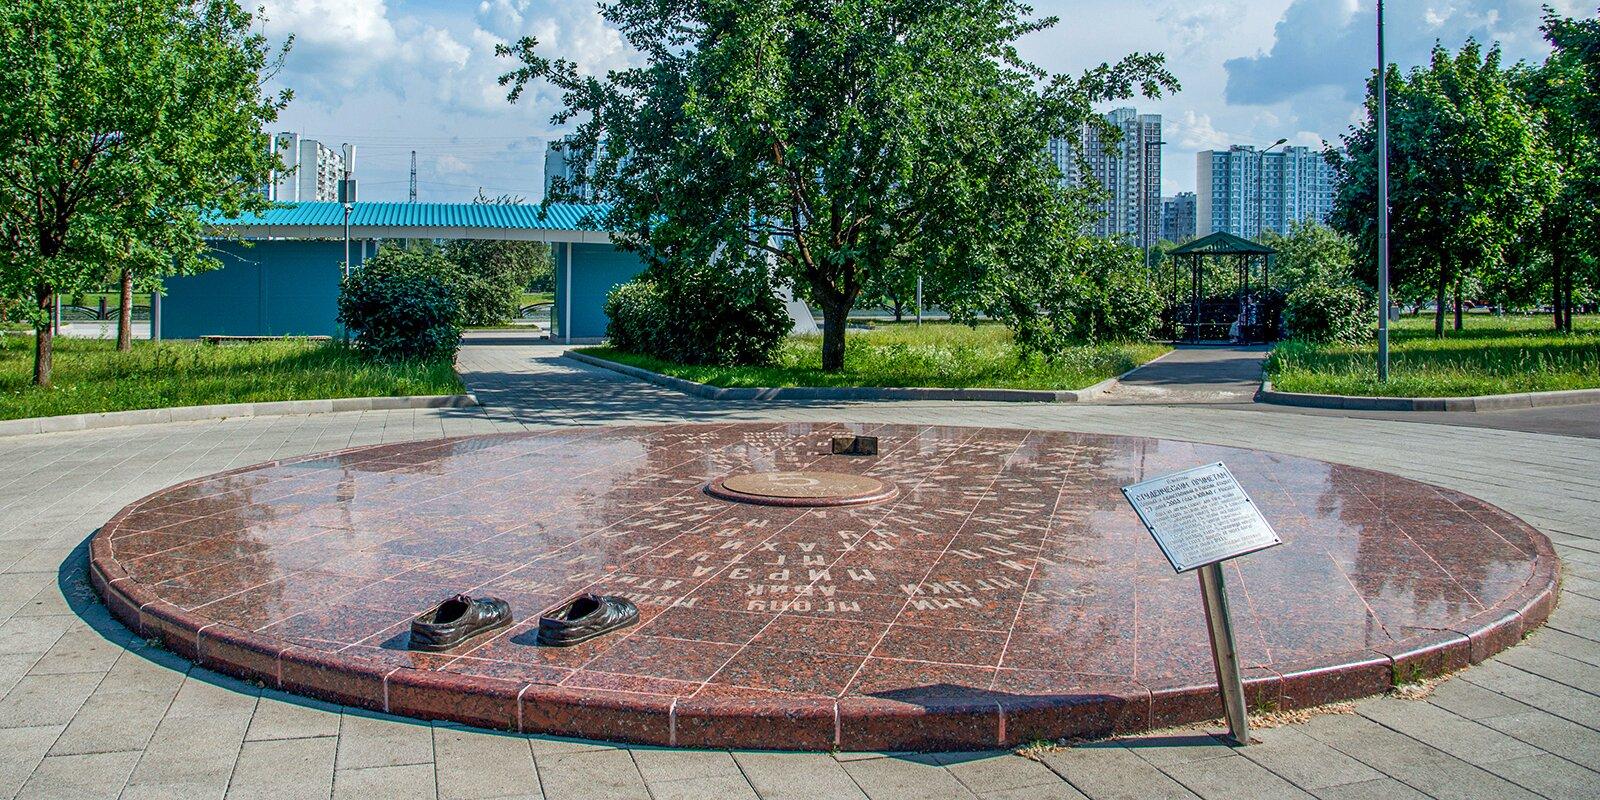 Фото Ю. Иванко. Mos.ru